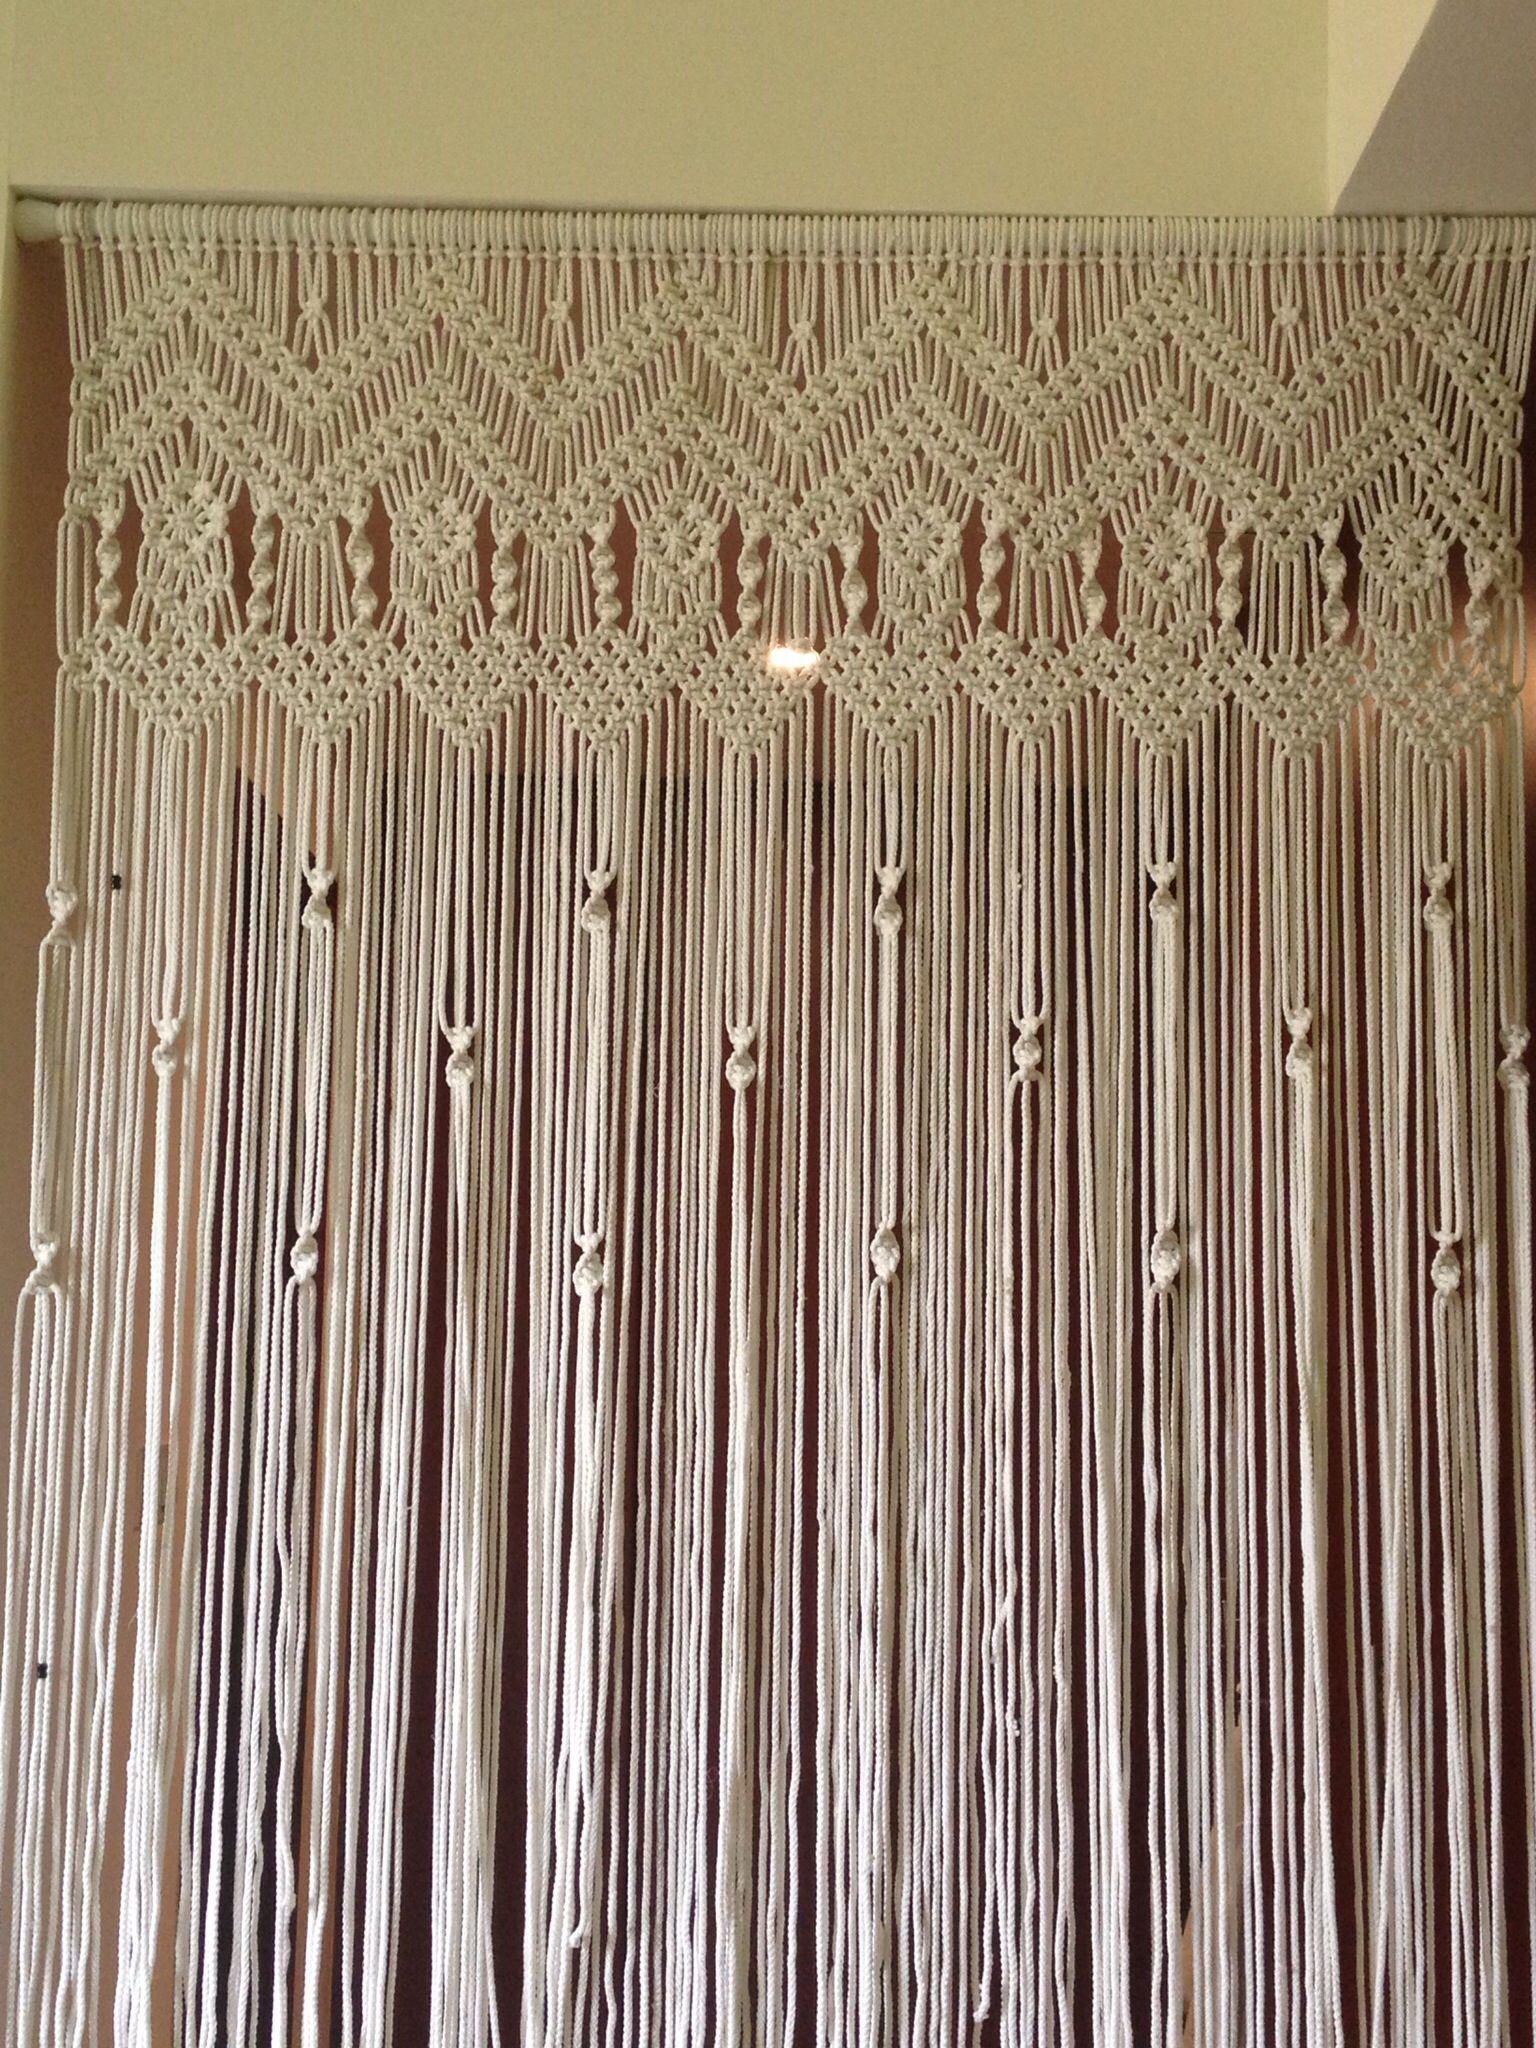 Macrame Curtain Hous Ish Pinterest